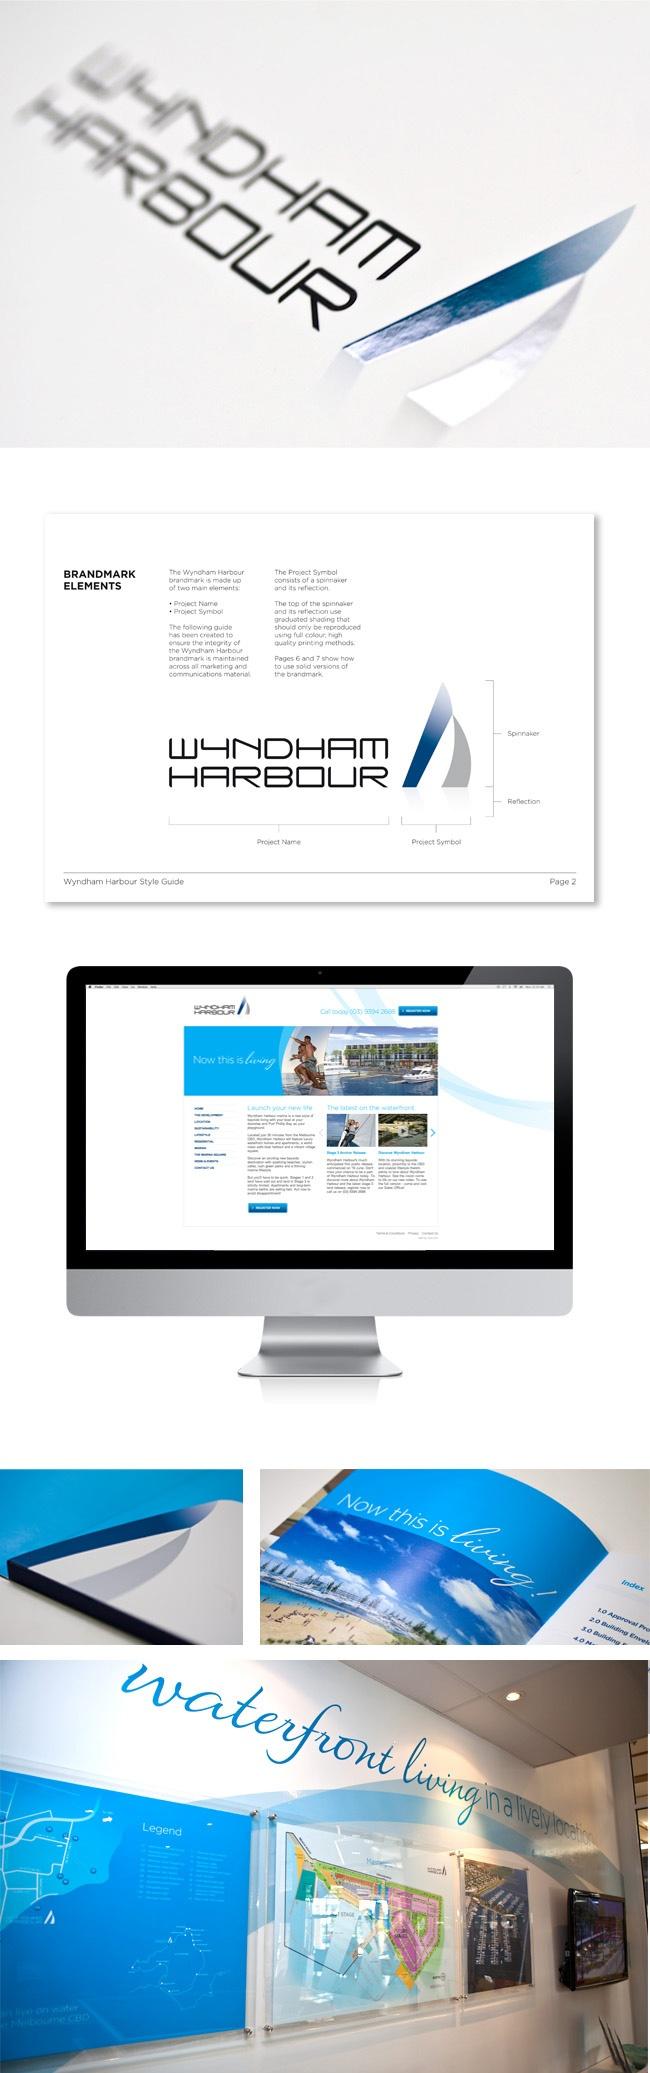 Wyndham Harbour - Brand & marketing campaign